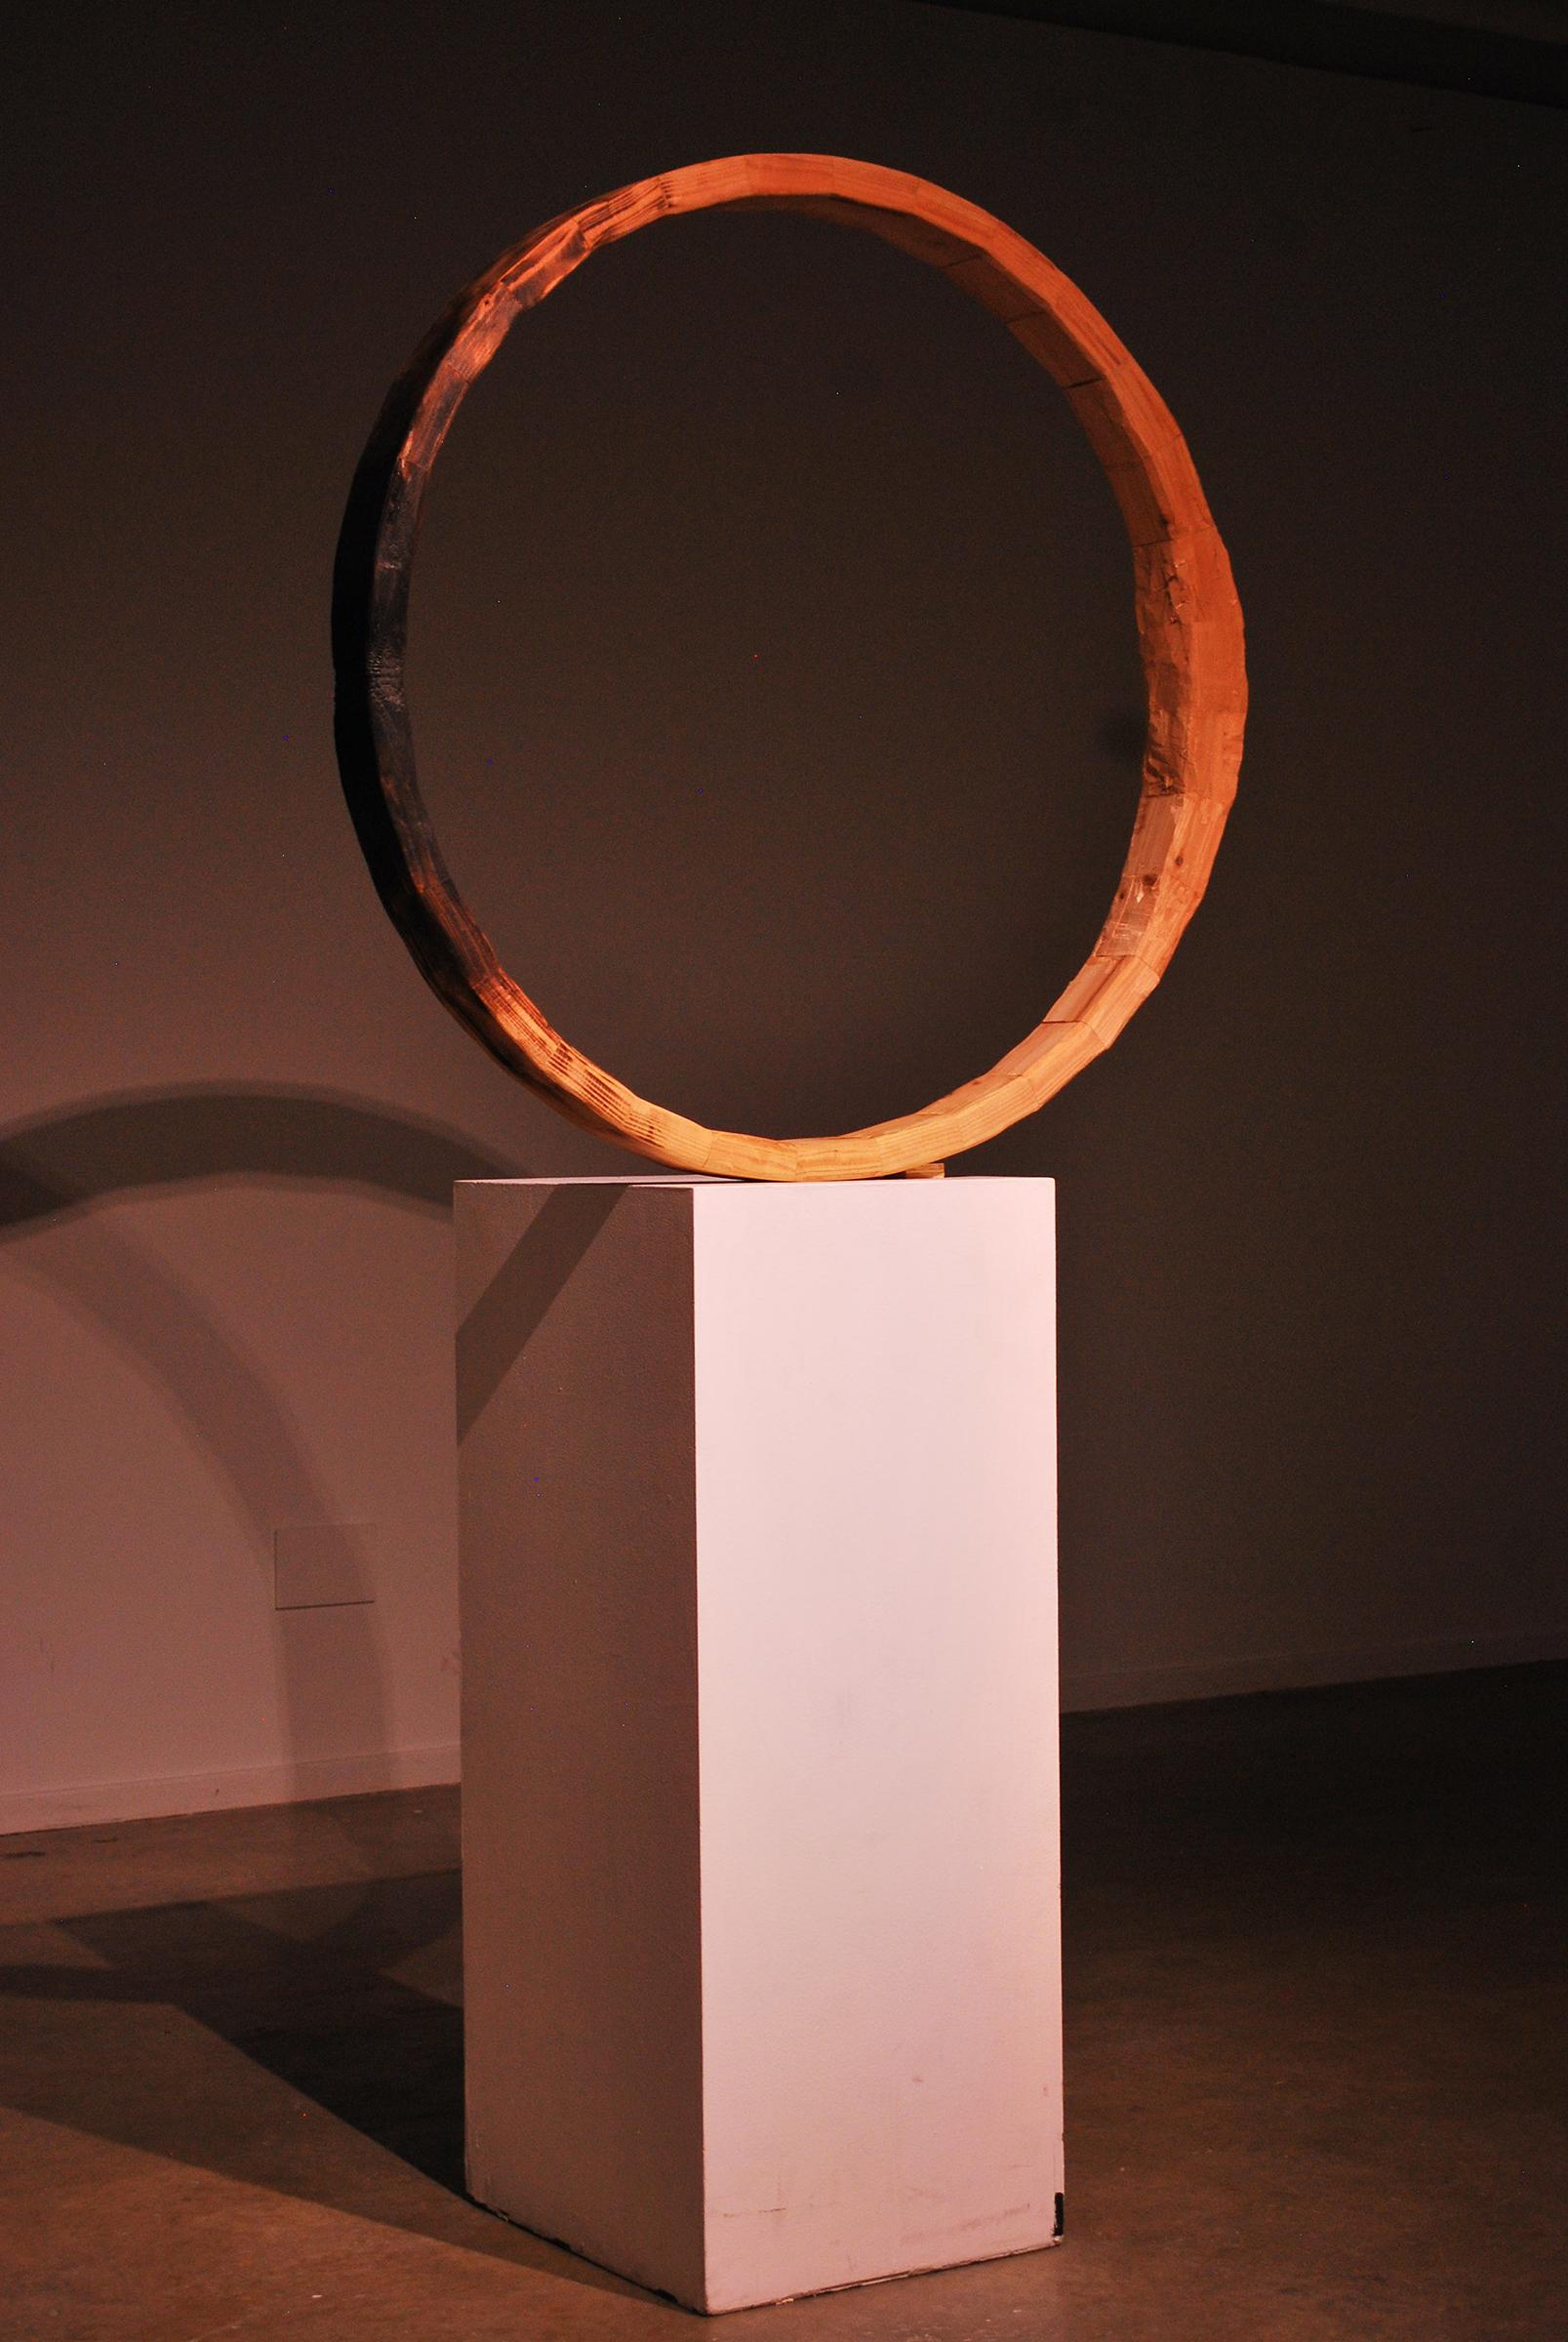 Diogenes III (ephemoral), wood sculpture by Nicholas Christensen.